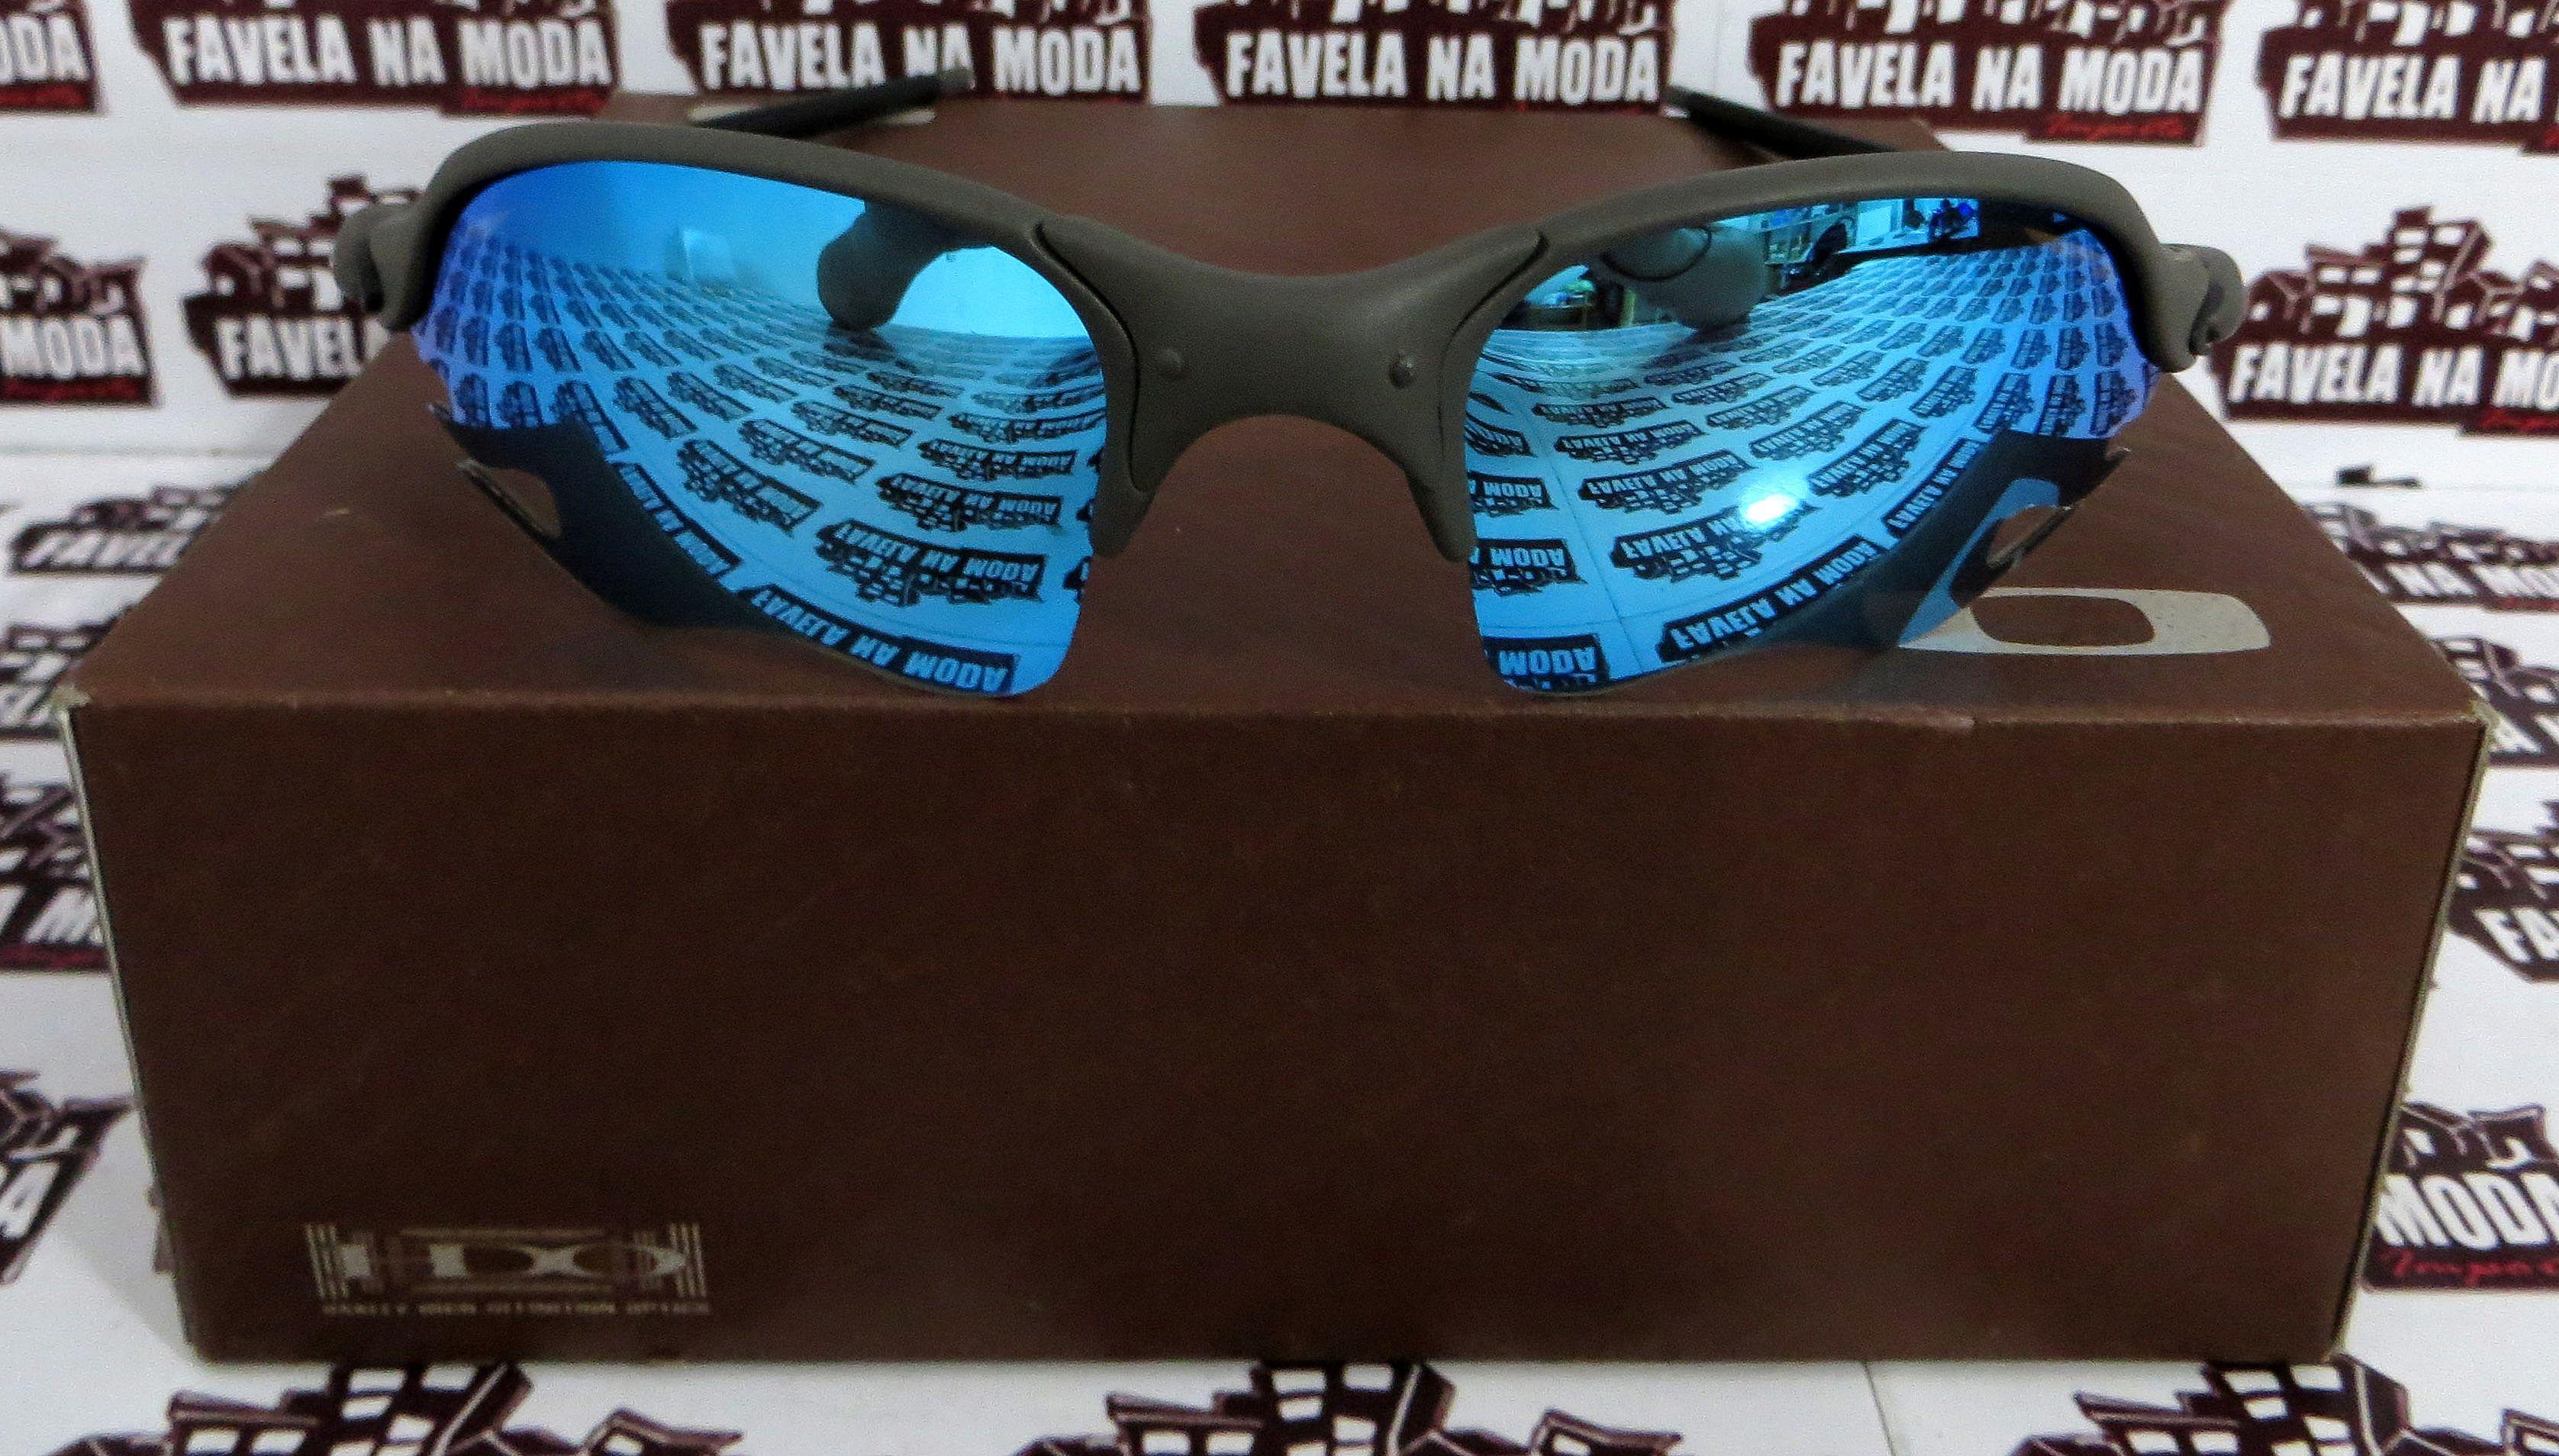 f4118ec2bb6a0 Óculos Oakley Romeo 2 - X-Metal   Ice Thug (flame)   Borrachas Pretas